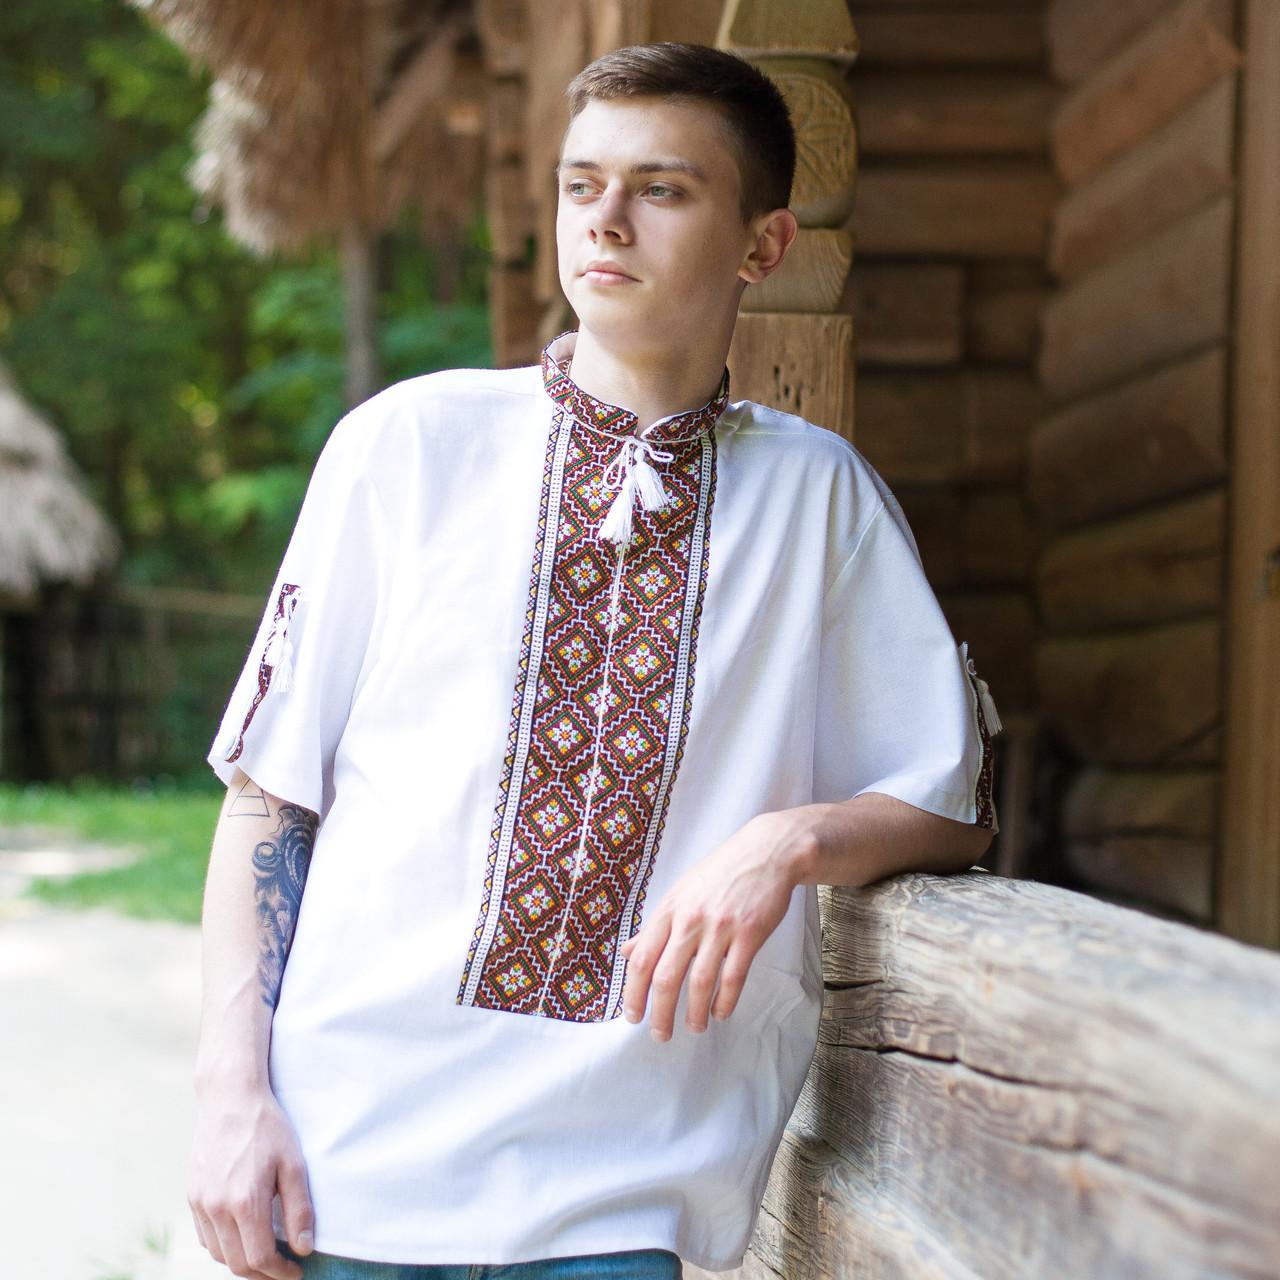 Вишита сорочка короткий рукав (домоткане полотно) 54cb03957436a